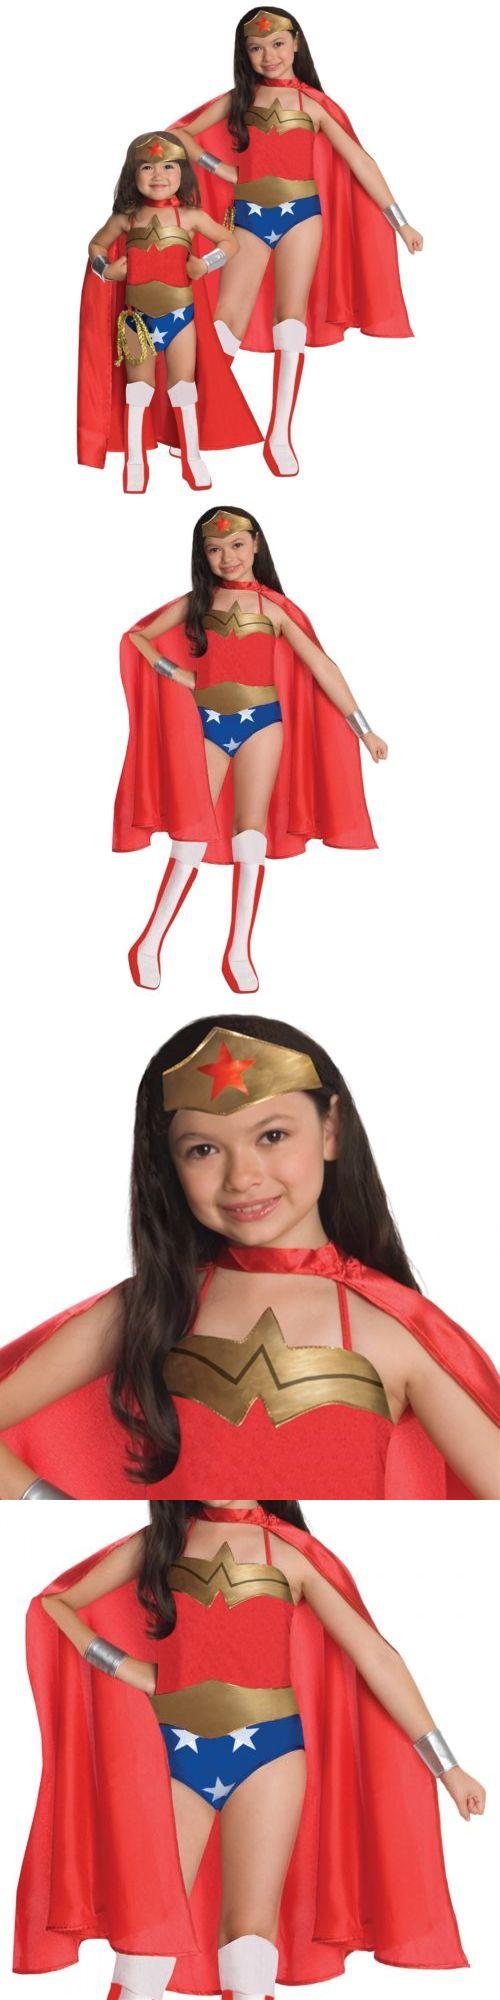 Kids Costumes: Wonder Woman Costume Kids Toddler Girls Superhero Halloween Fancy Dress -> BUY IT NOW ONLY: $30.49 on eBay!